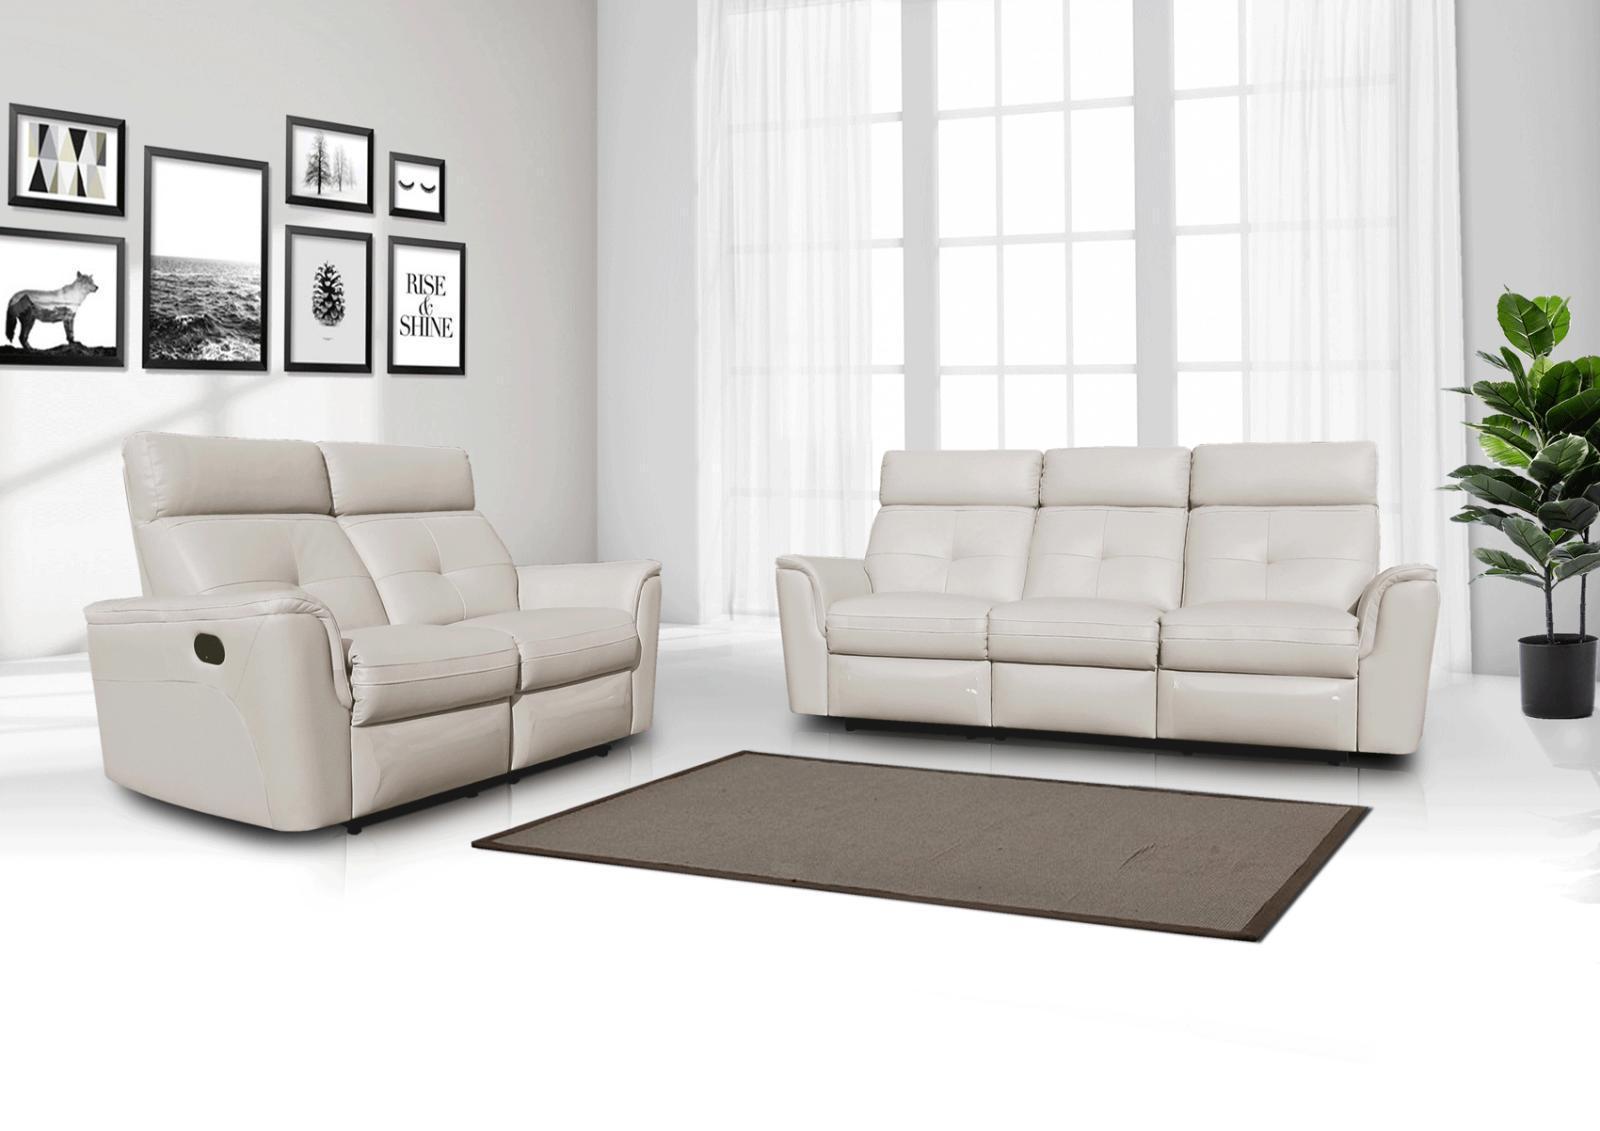 Esf 8501 Contemporary White Italian Leather Recliner Sofa Set 2 Pcs